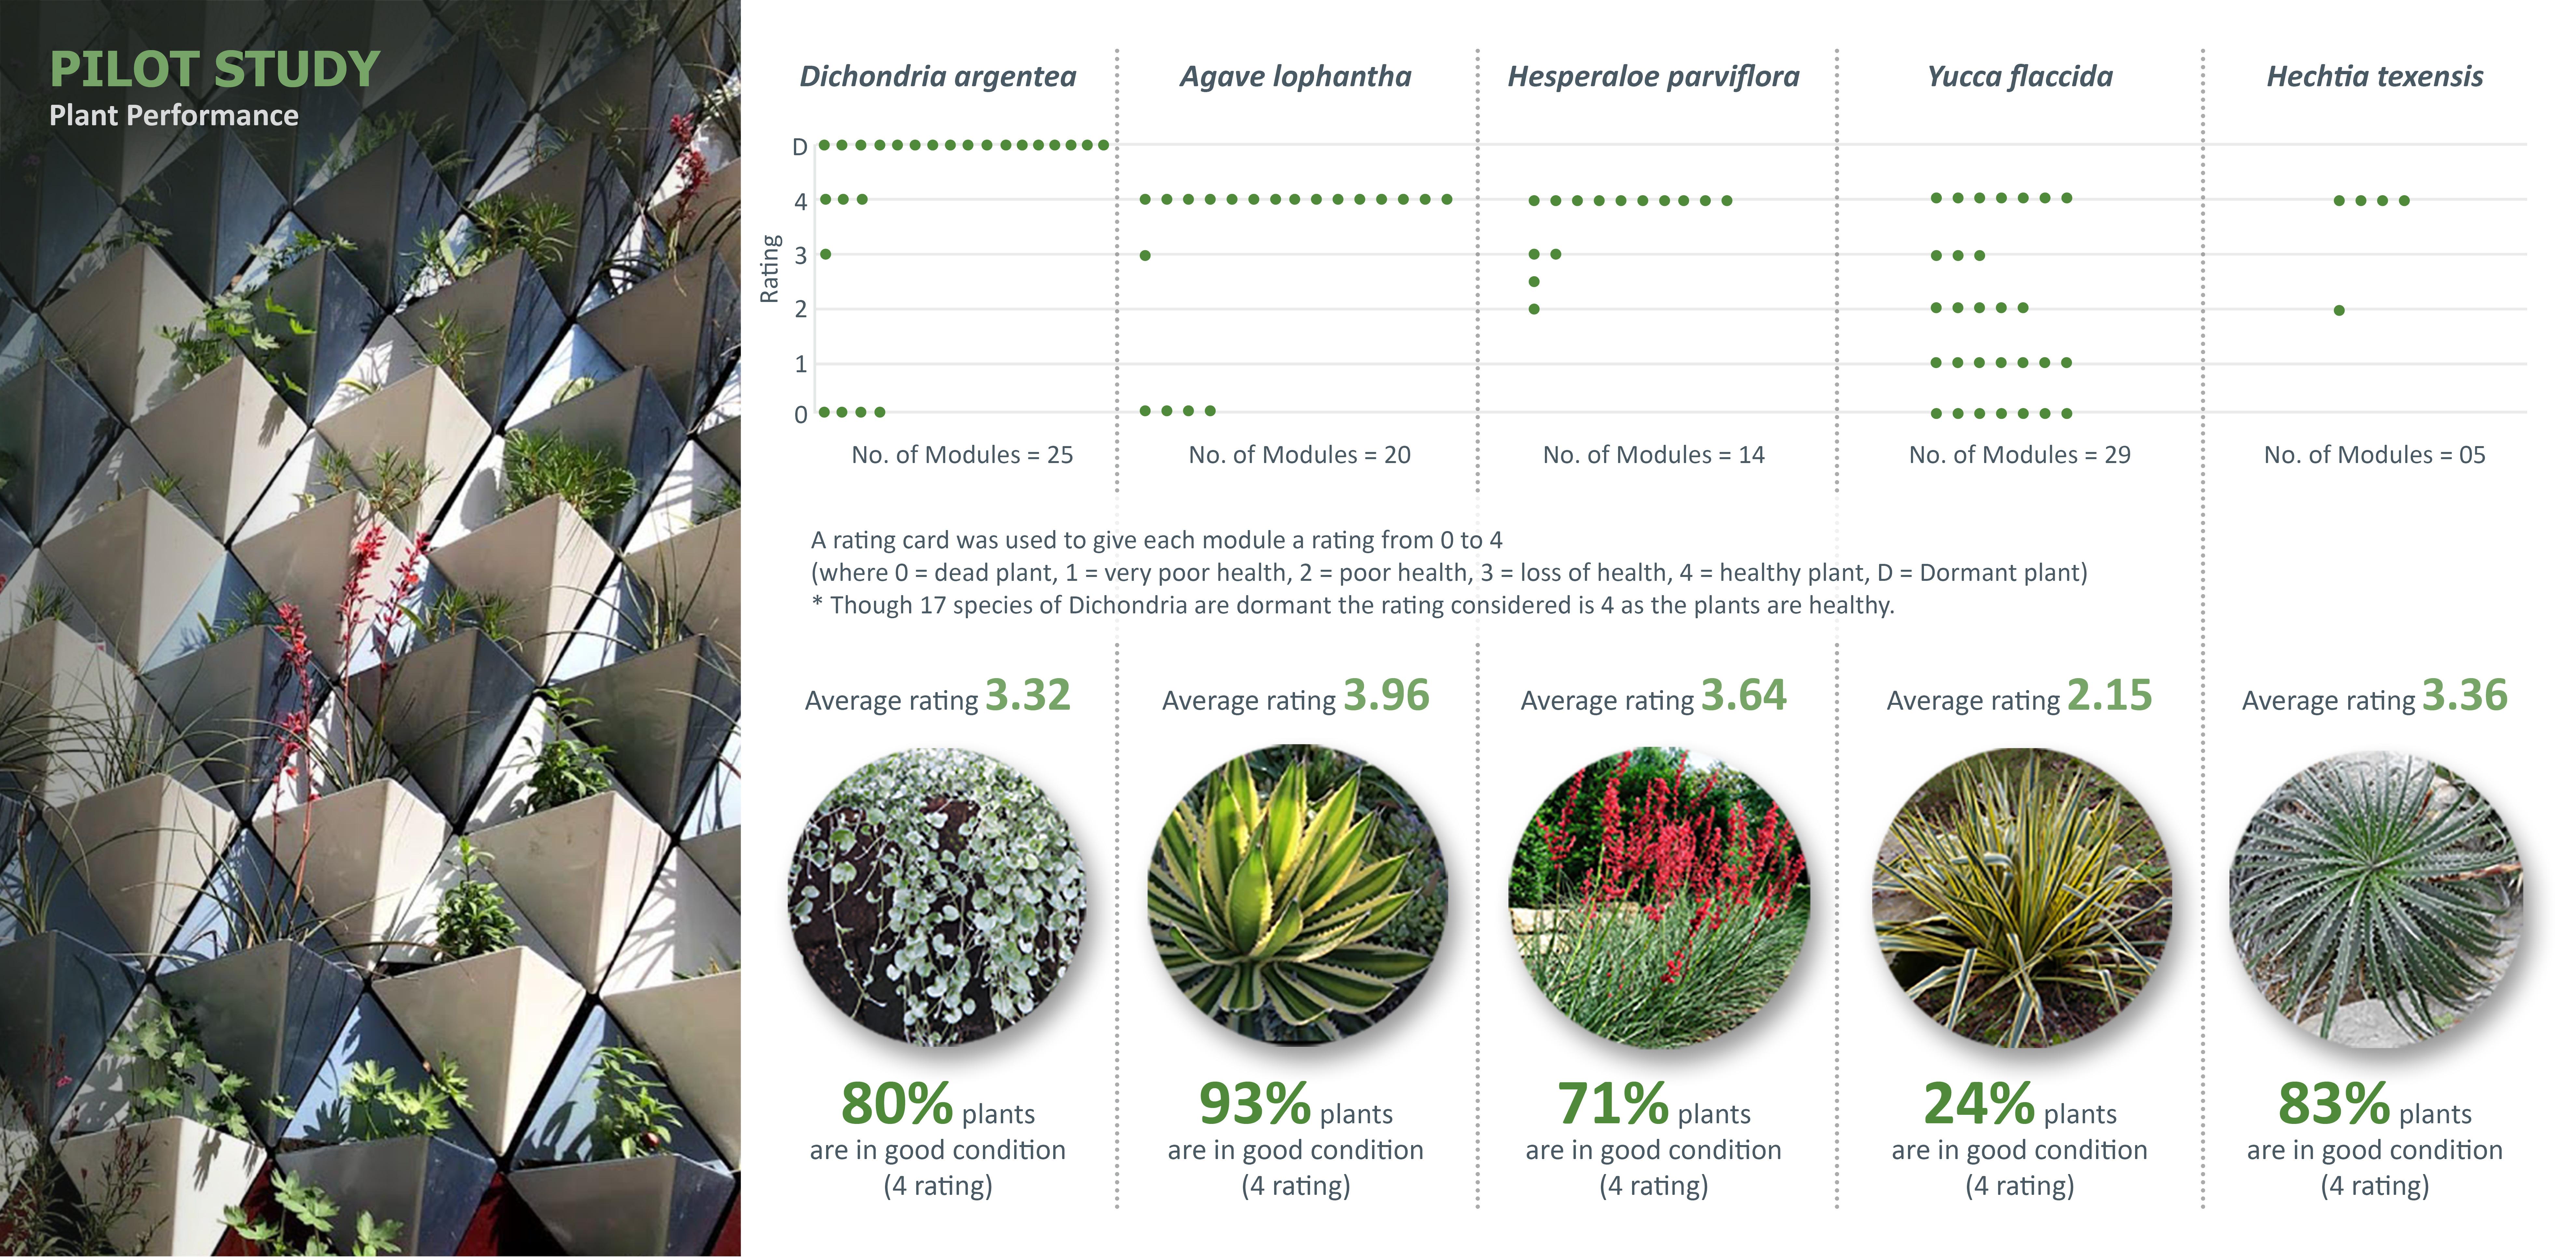 Pilot Study: Plant Performance